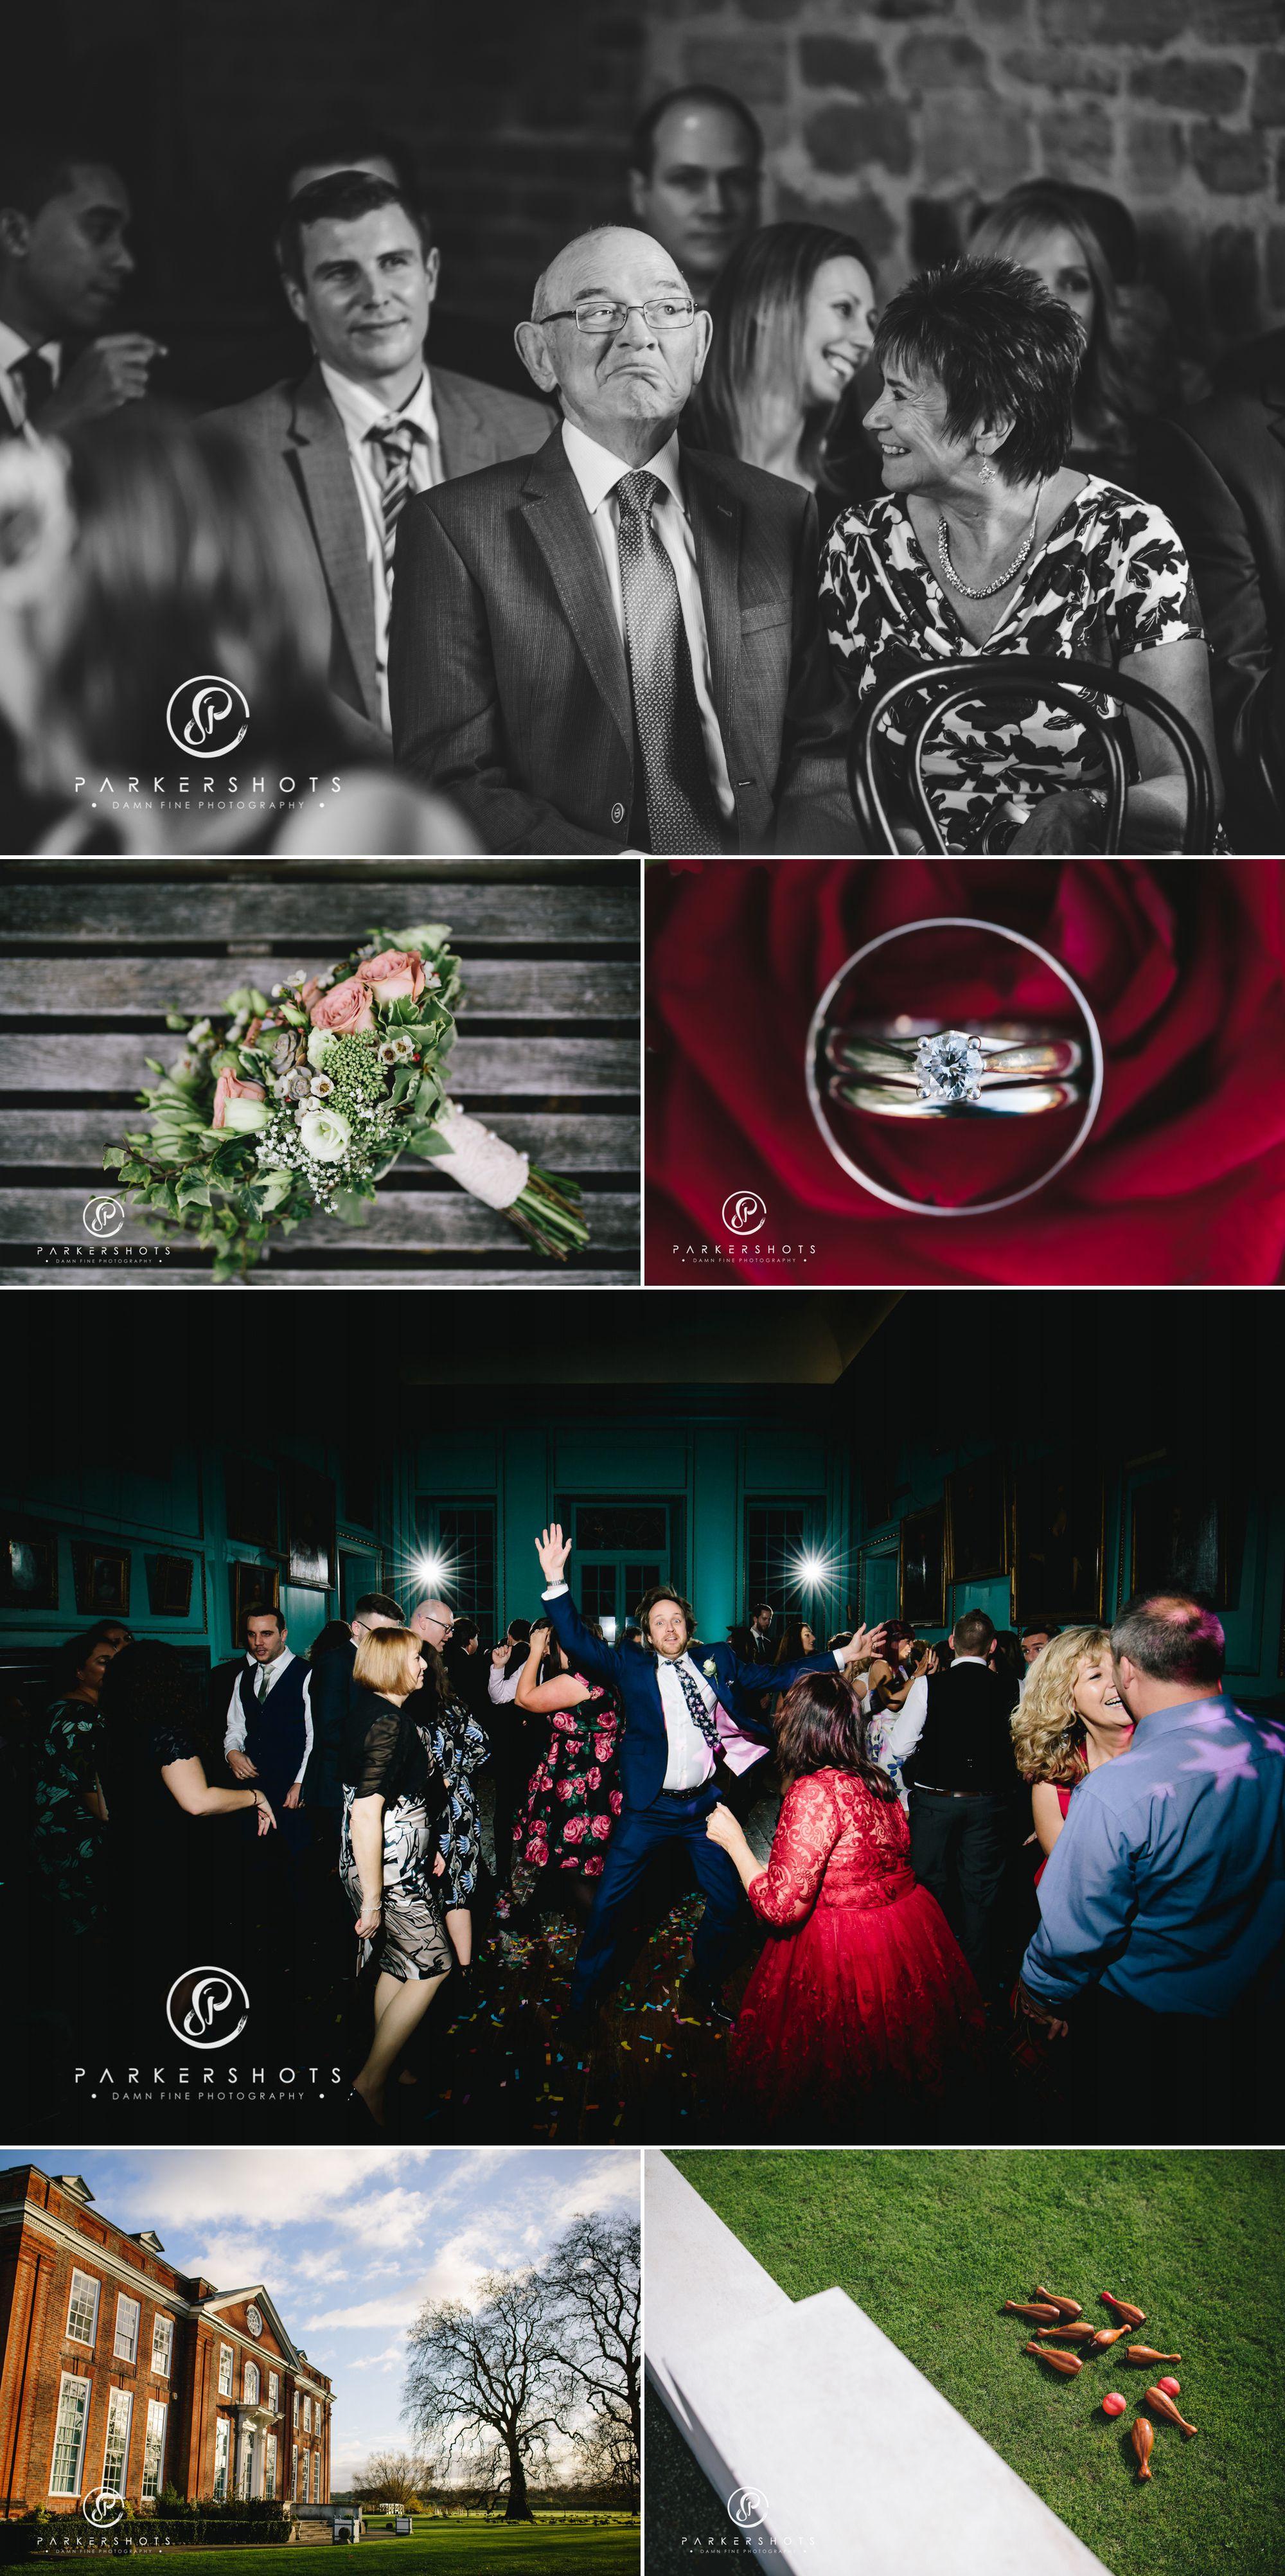 Best_Of_Wedding_Photographer_2015 6